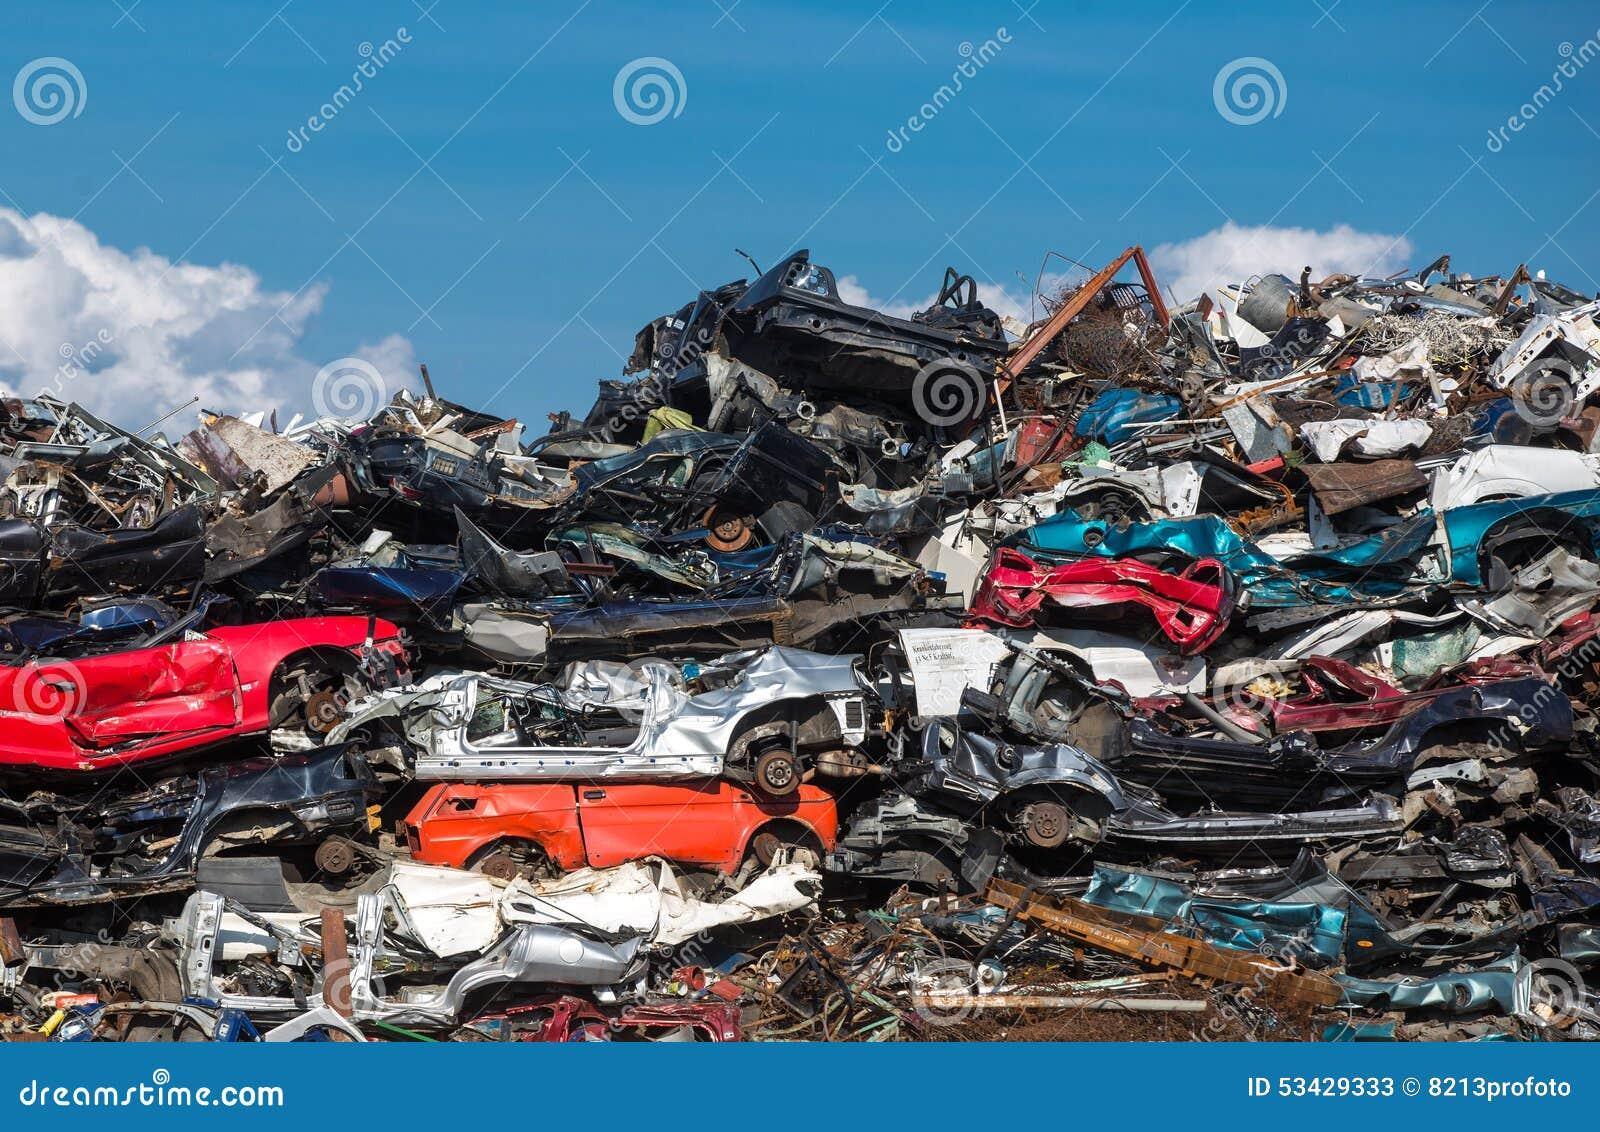 Pile Of Used Cars, Car Scrap Yard Stock Image - Image of heap, iron ...